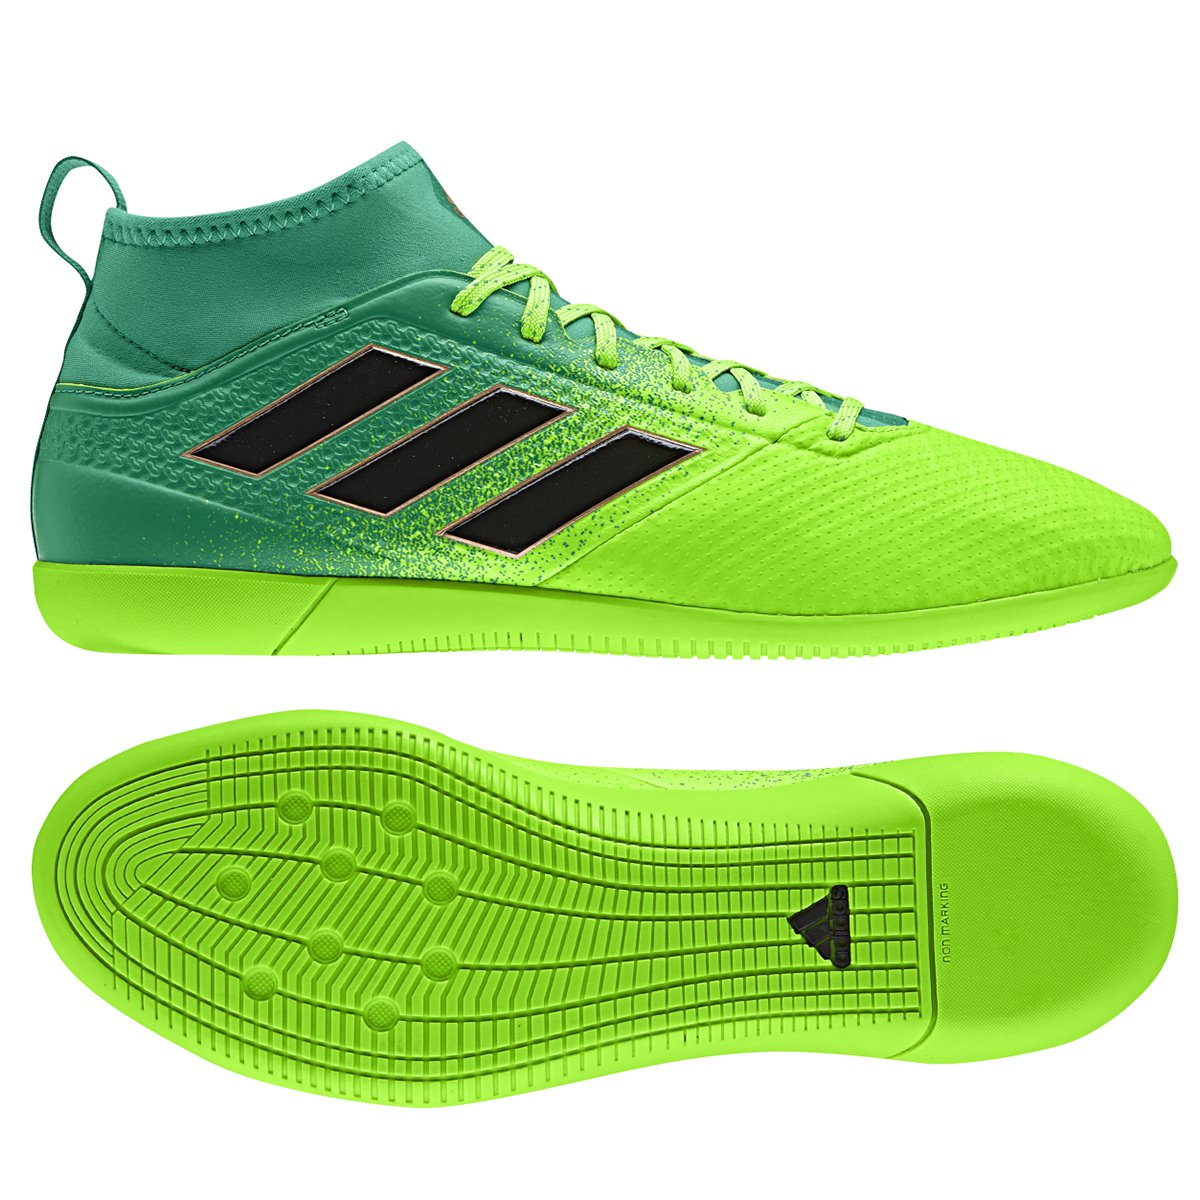 622feade9e Chuteira Futsal Adidas Ace 17.3 IN - Verde e Preto